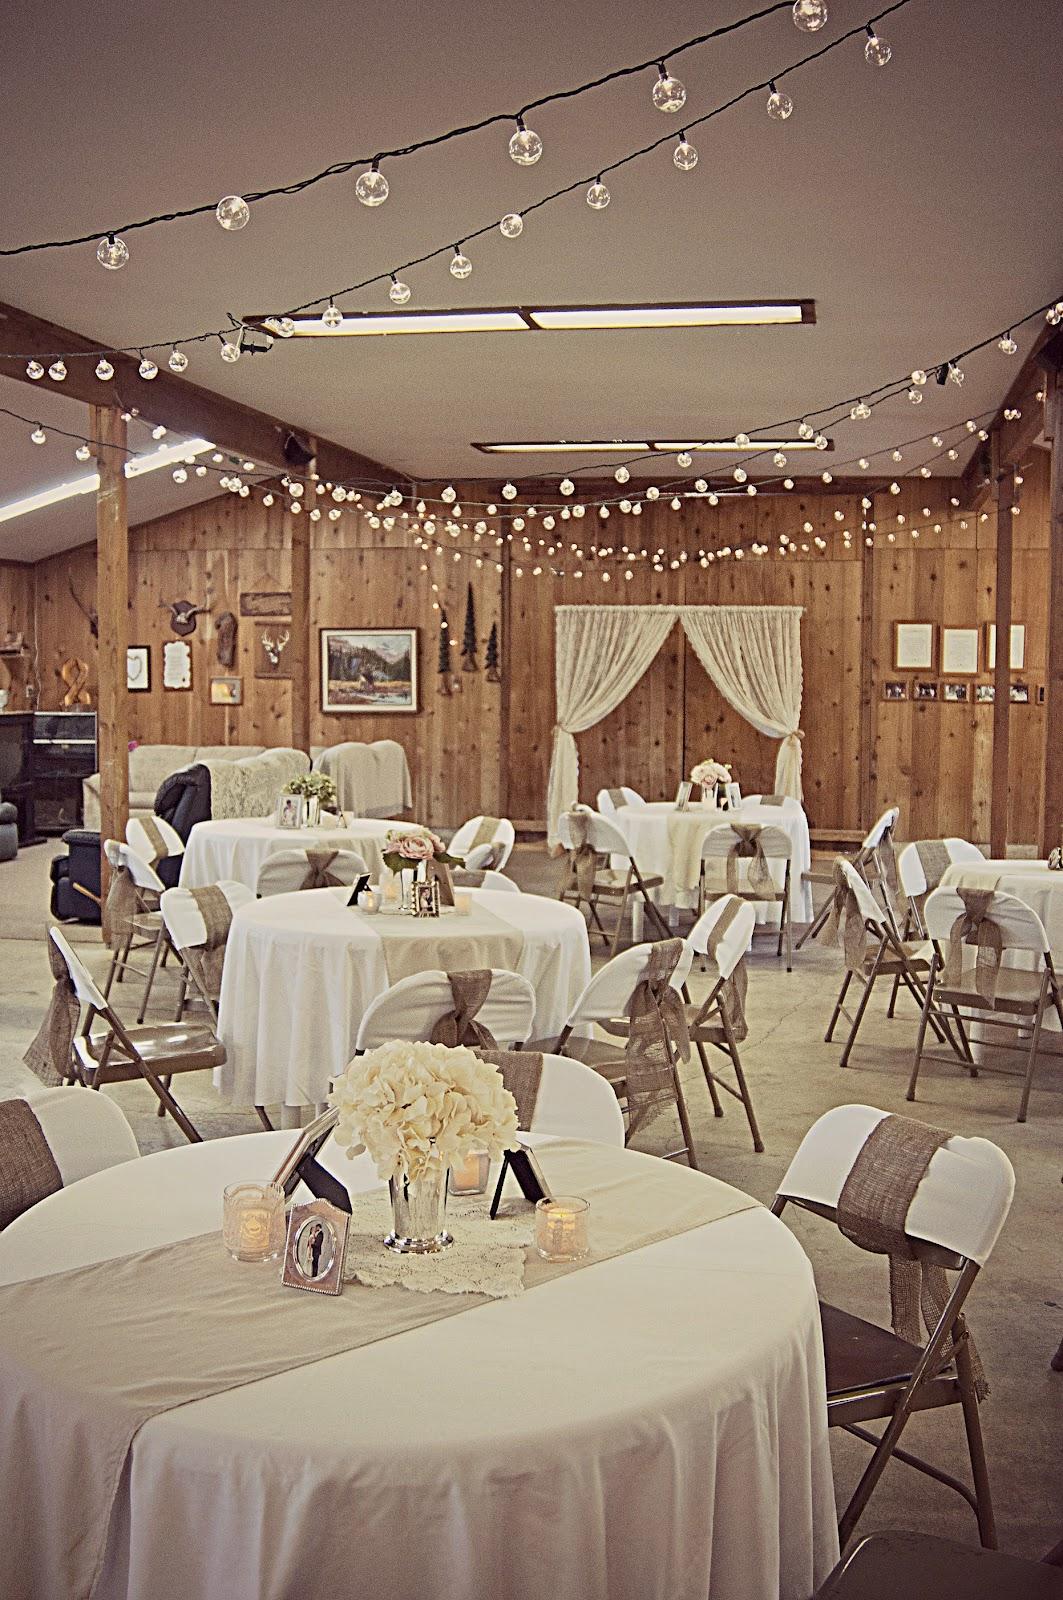 jessica hills photography seattle barn reception. Black Bedroom Furniture Sets. Home Design Ideas